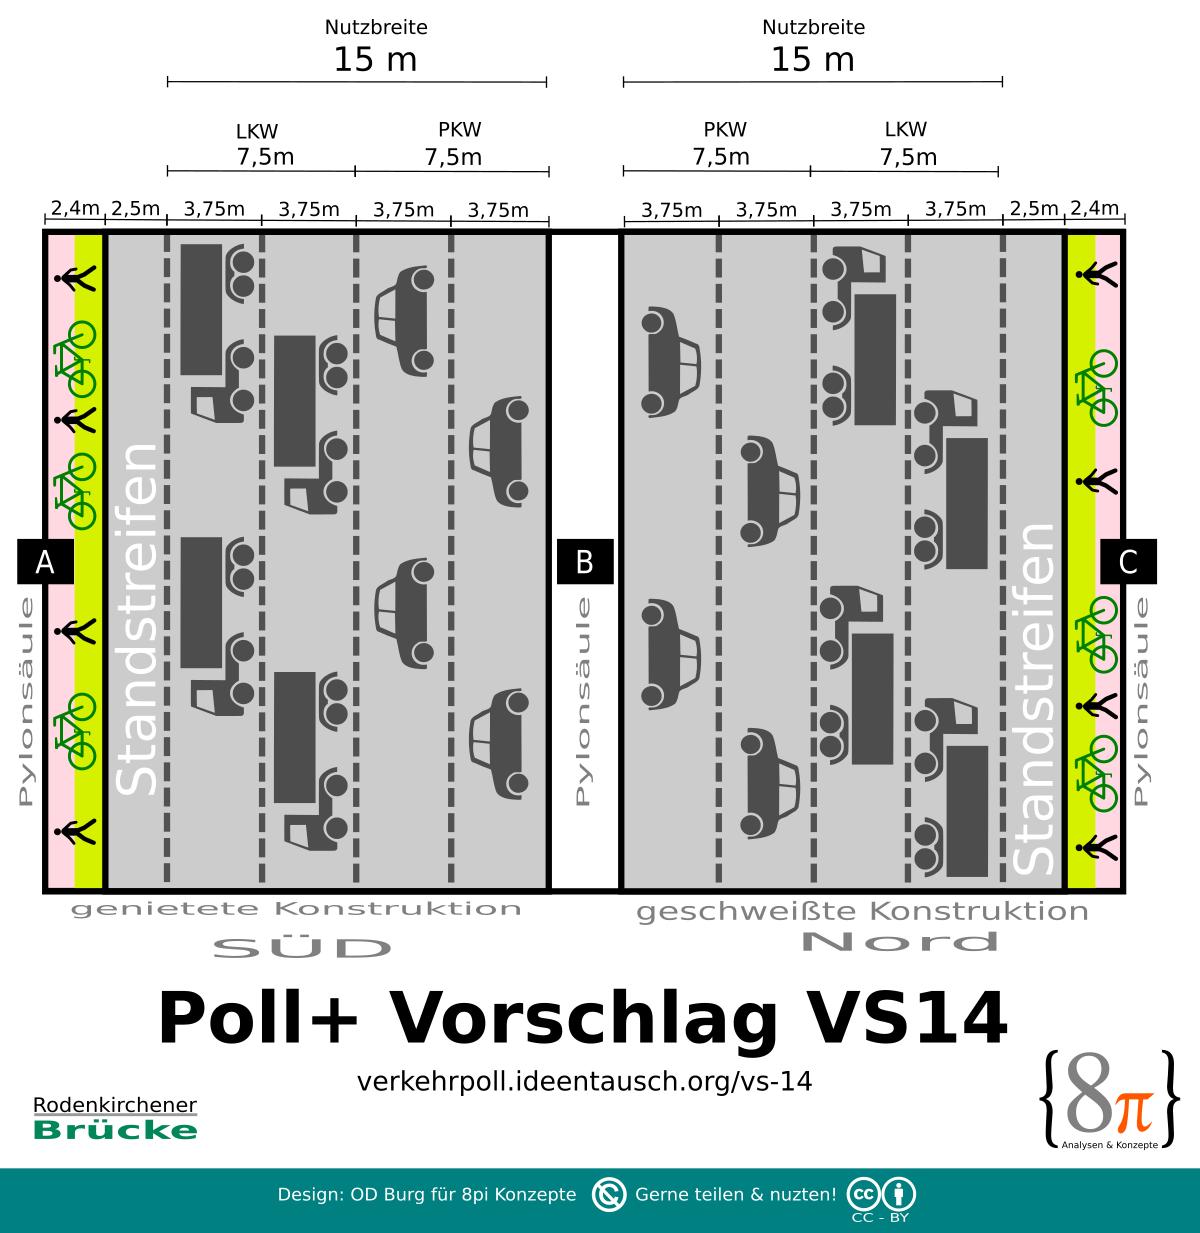 Vorschlag VS-14